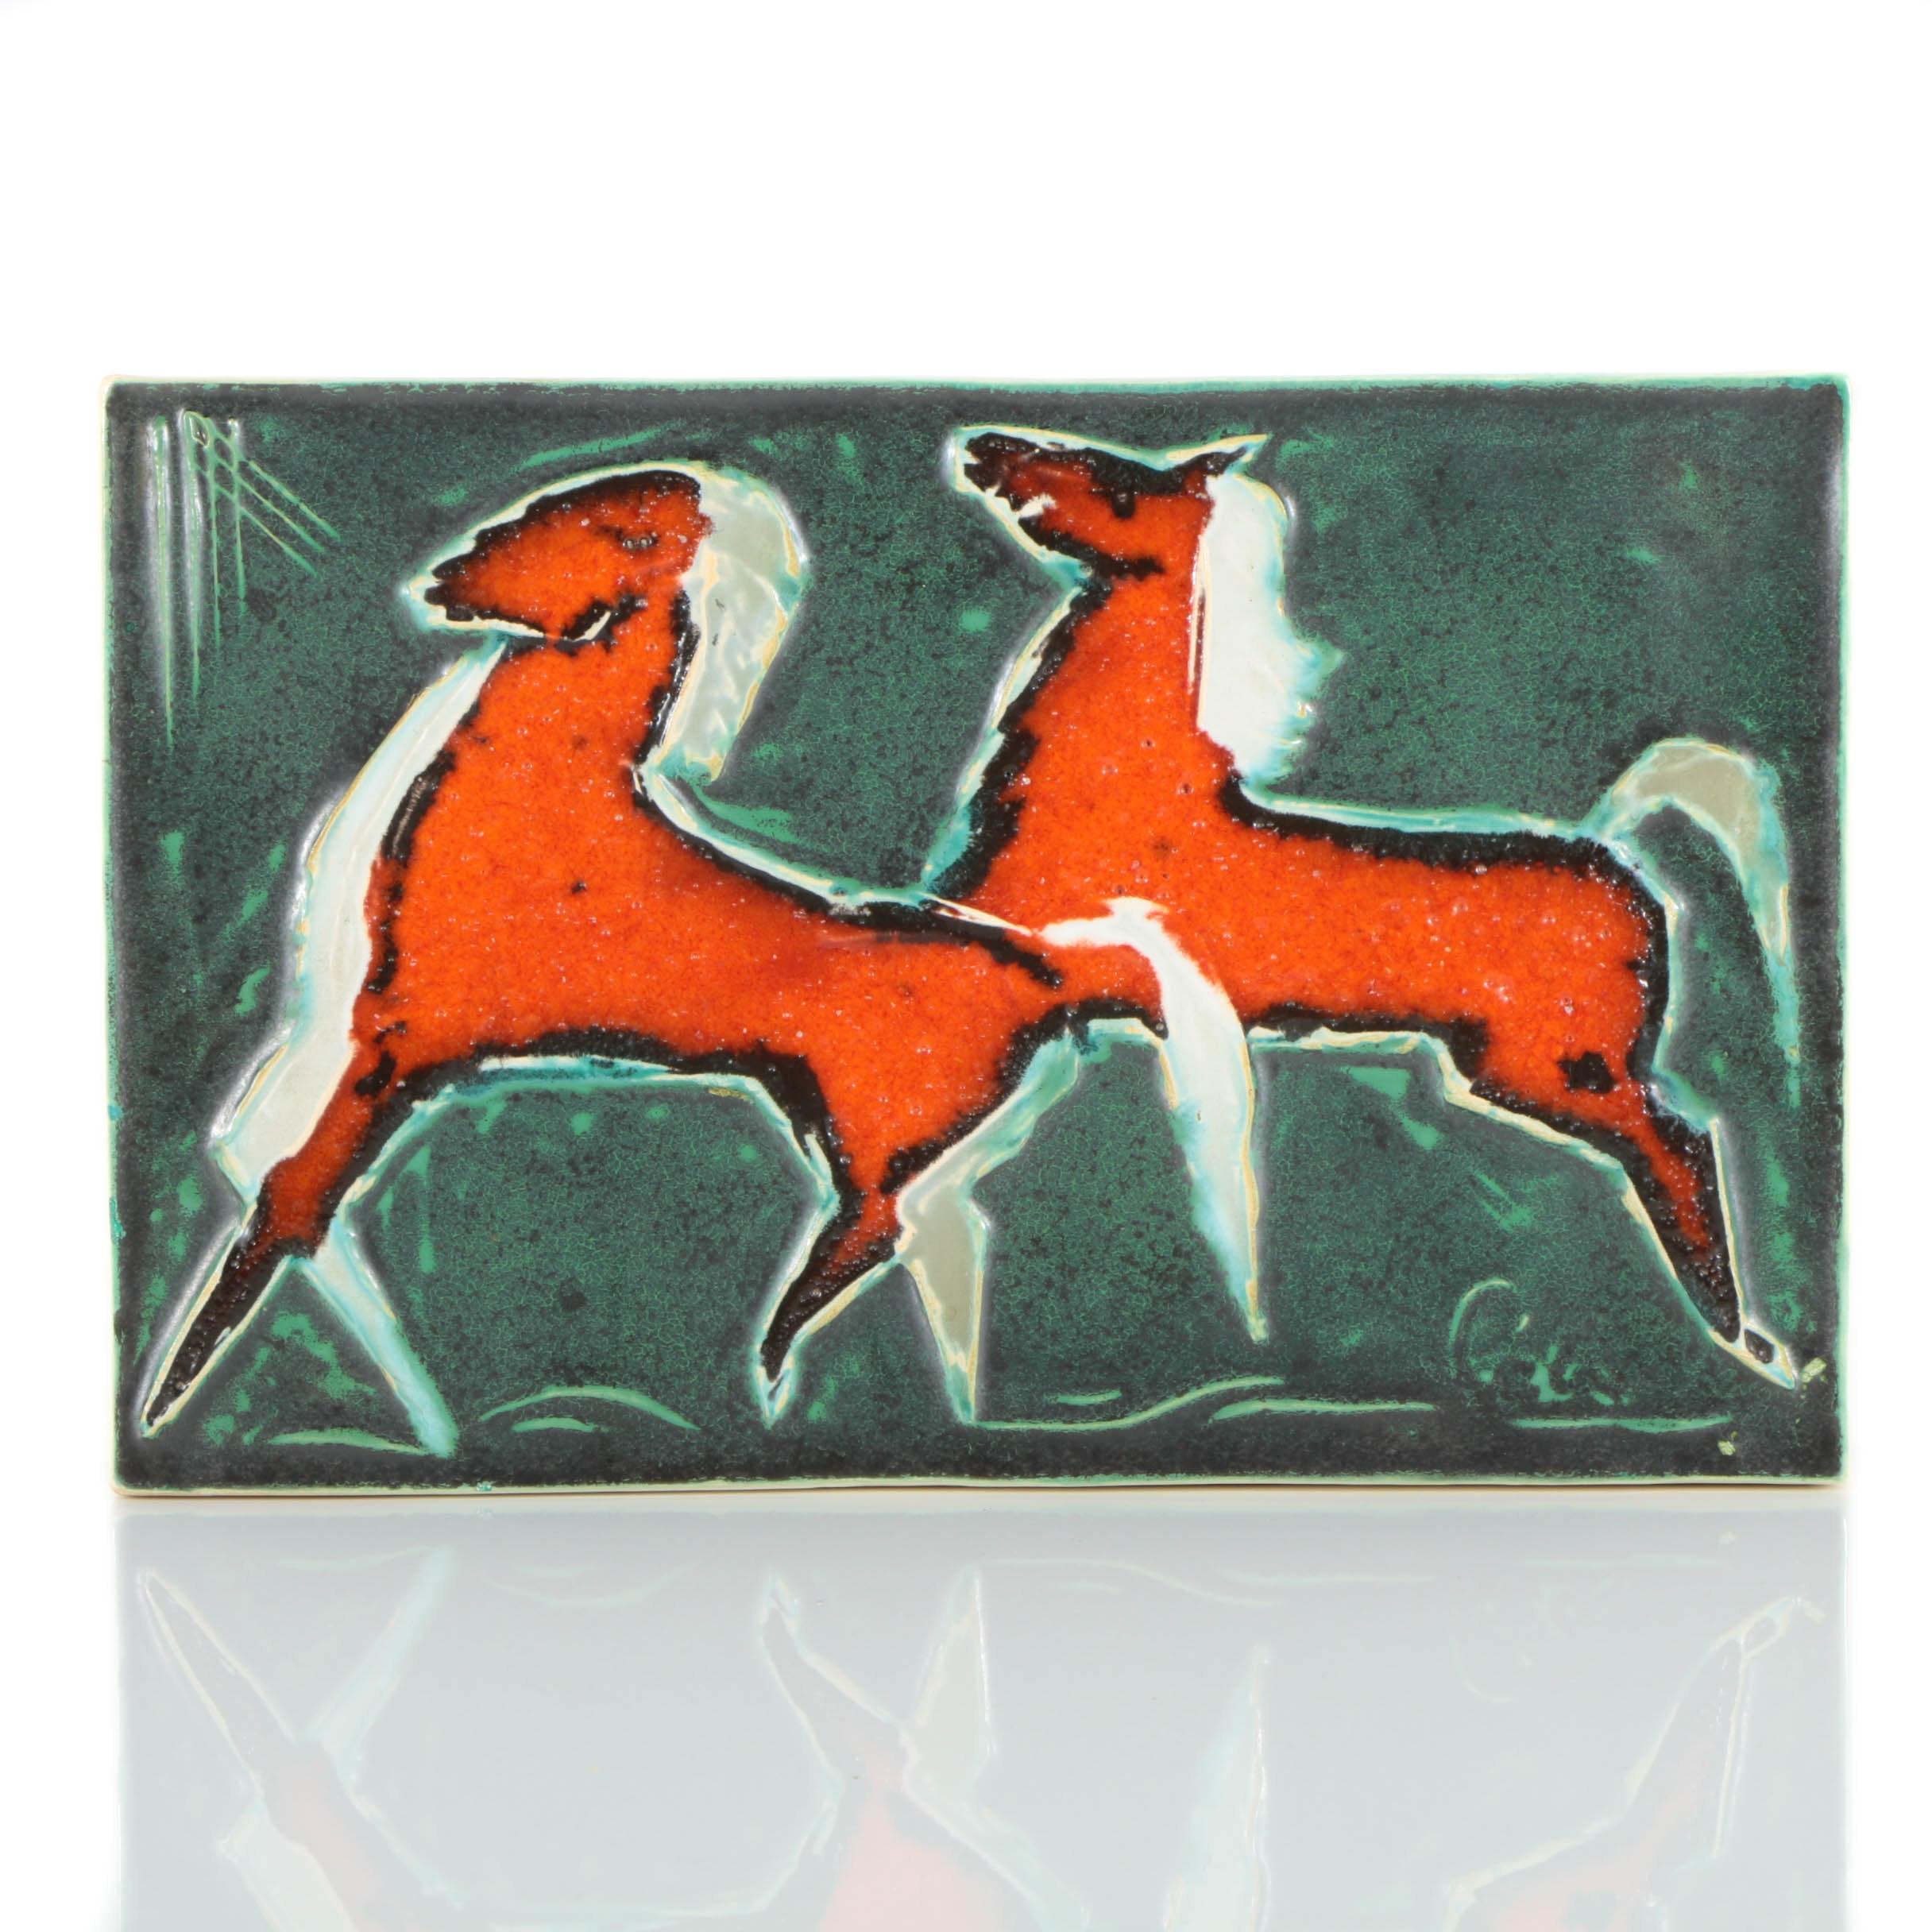 Helmut Schäffenacker Ceramic Wall Plaque of Horses